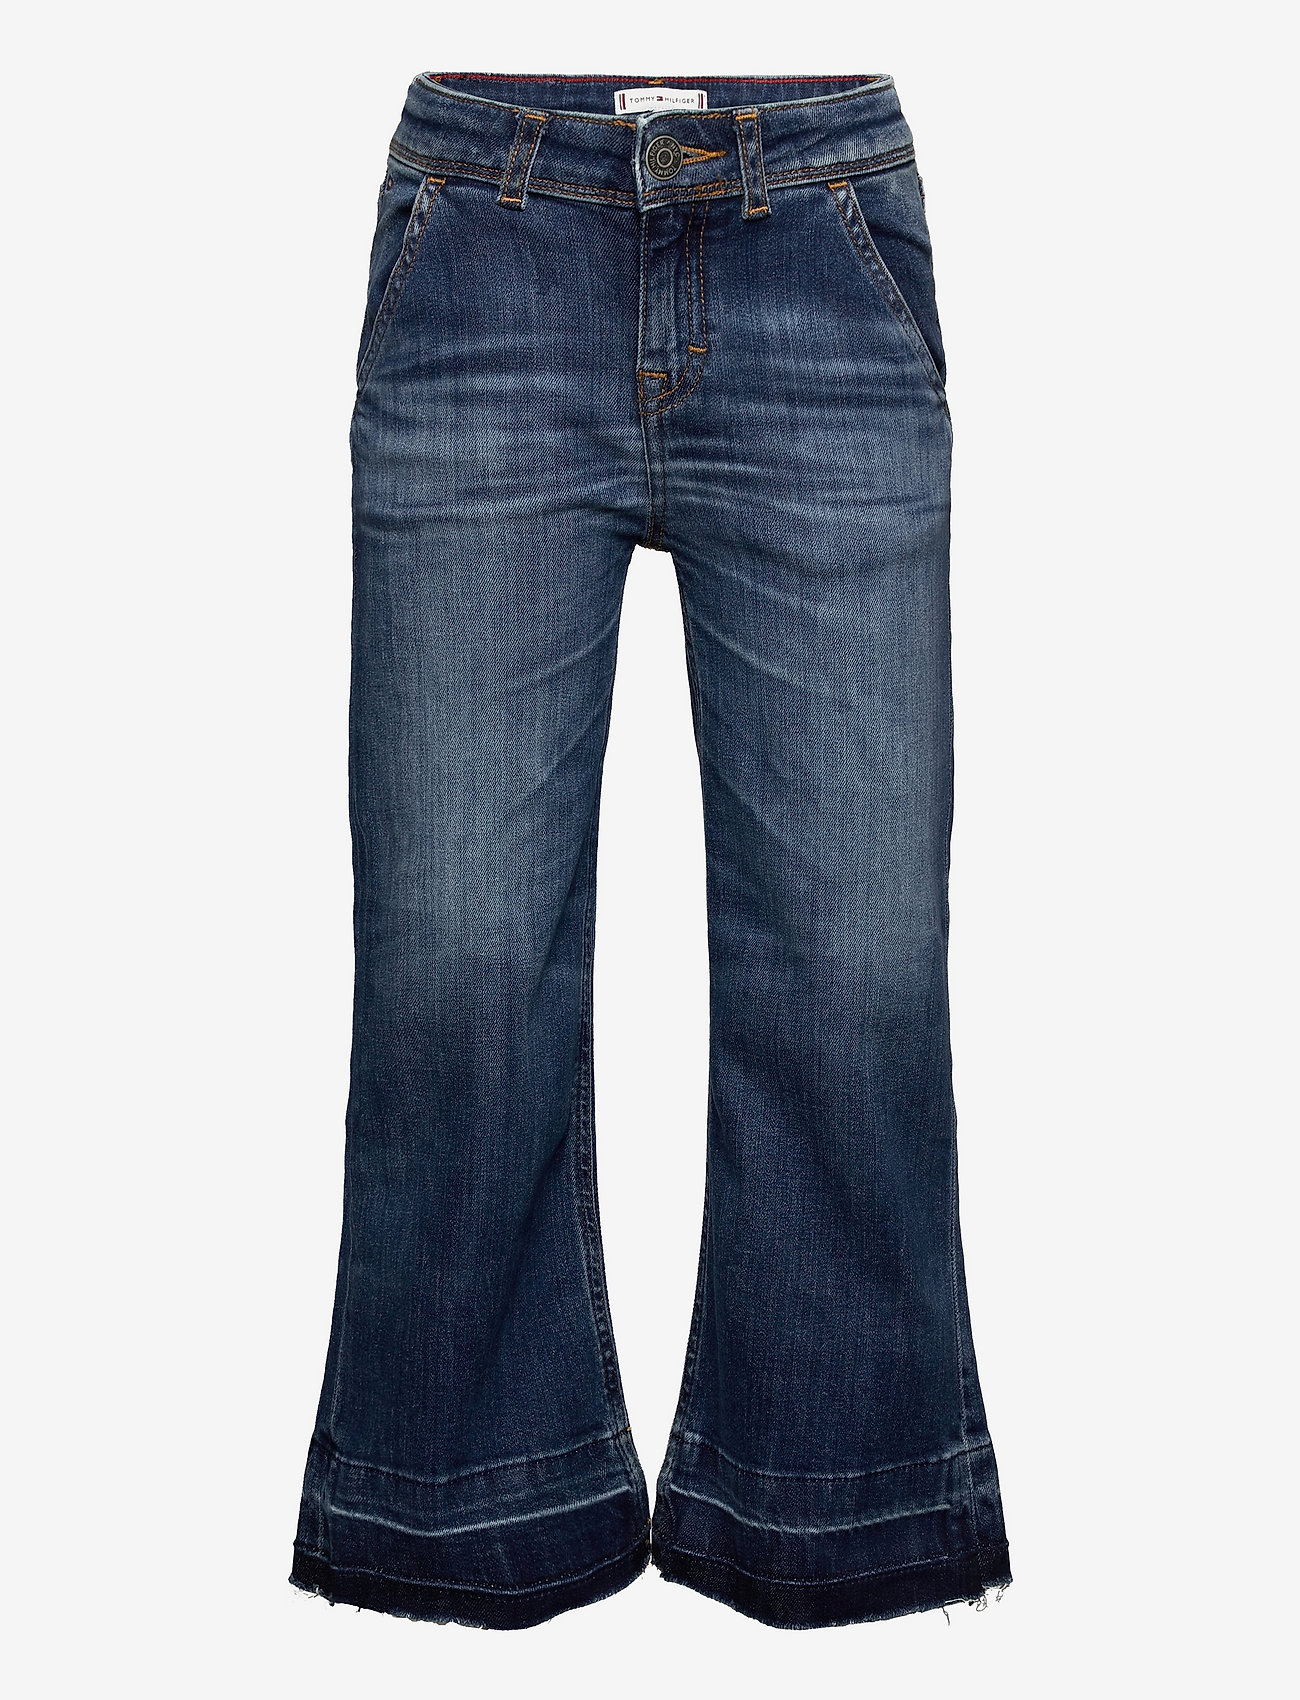 Tommy Hilfiger - WIDE LEG - AUHERDKS - jeans - auth heritage dk used str - 0